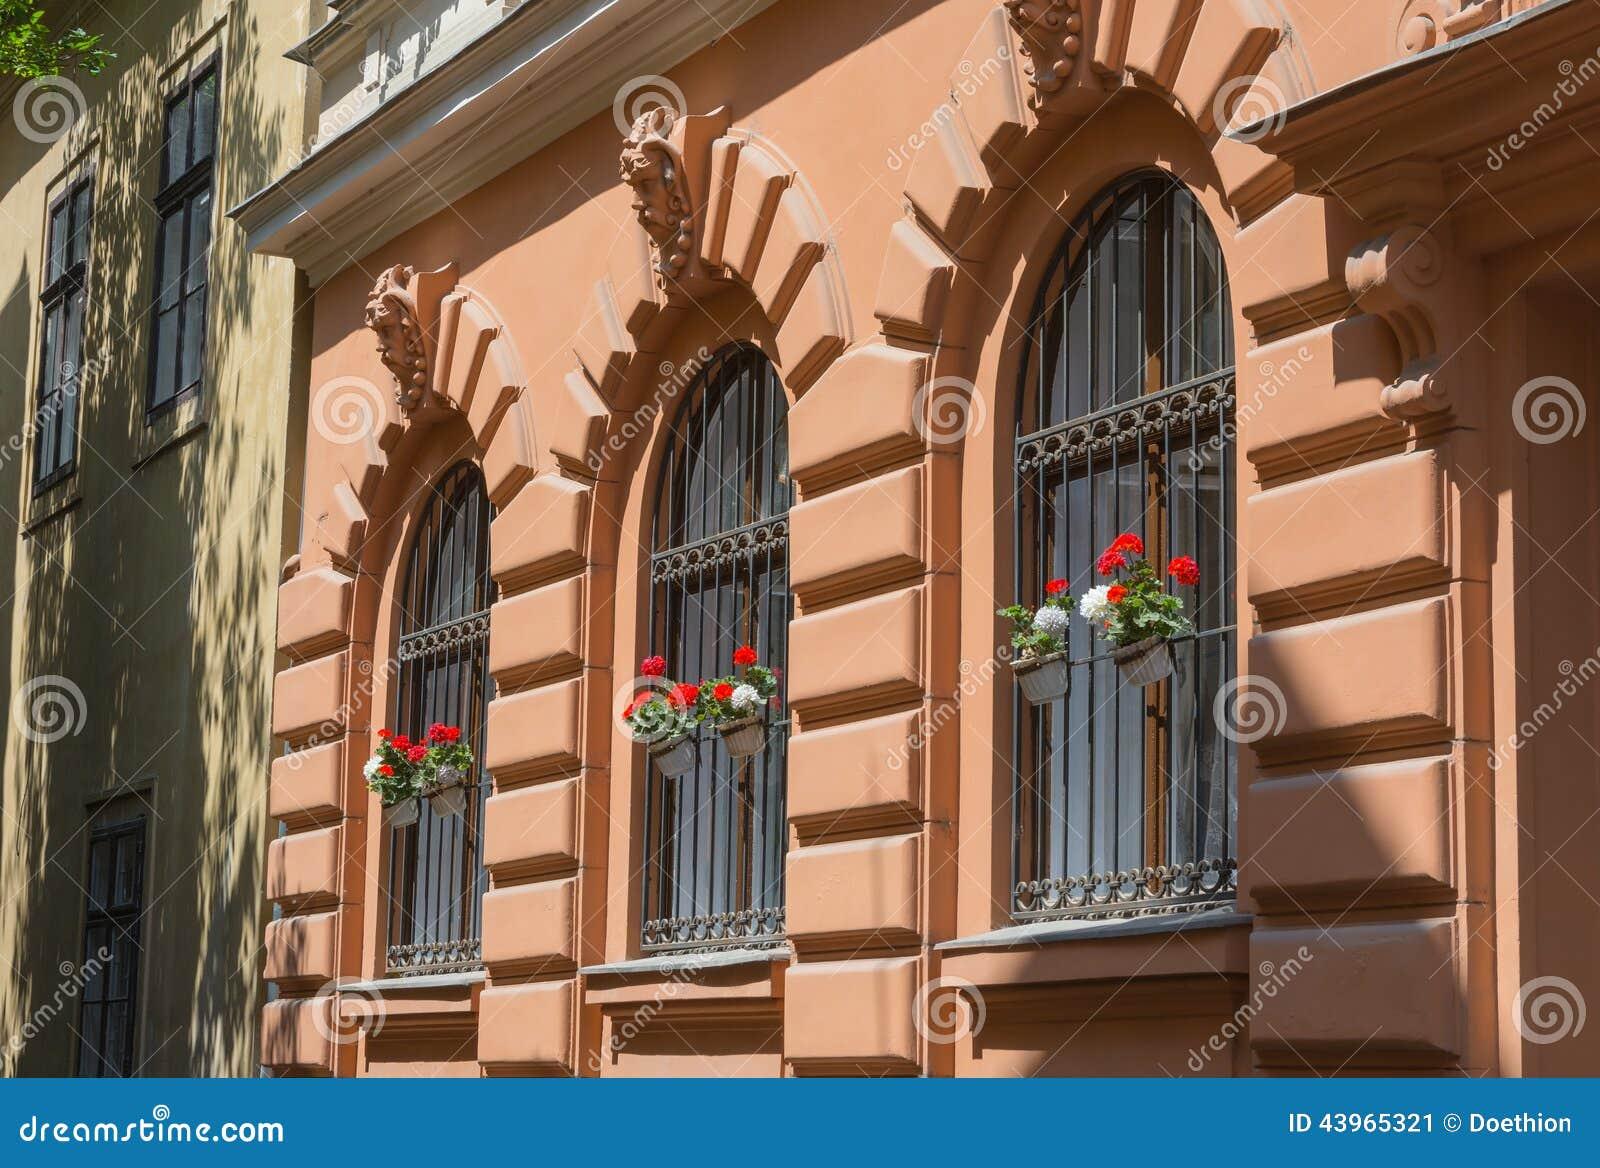 Ornate Wrought Iron Window Shutters Stock Photo Image